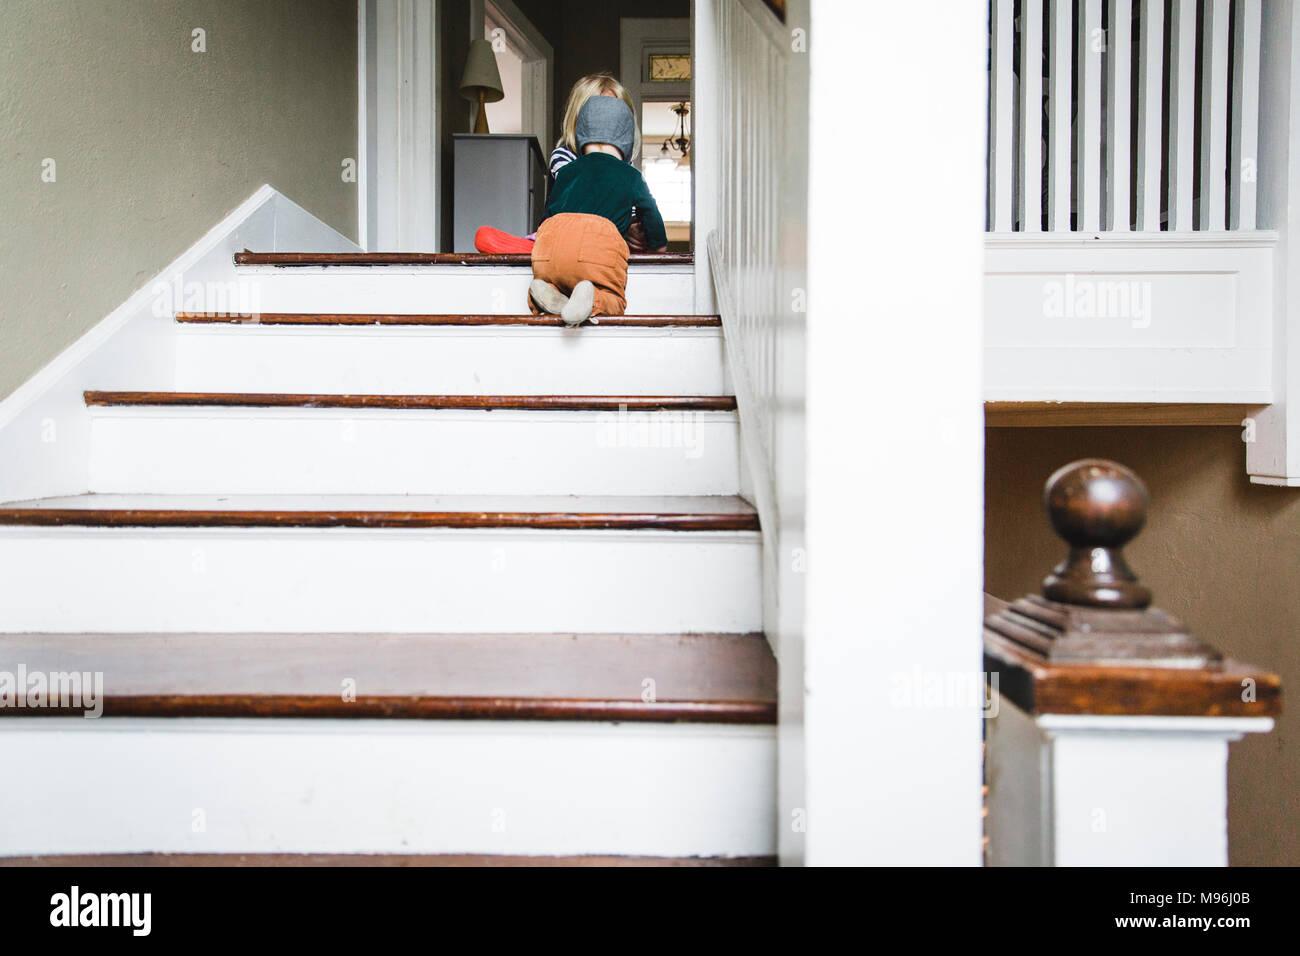 baby krabbeln die treppe stockfoto bild 177781419 alamy. Black Bedroom Furniture Sets. Home Design Ideas